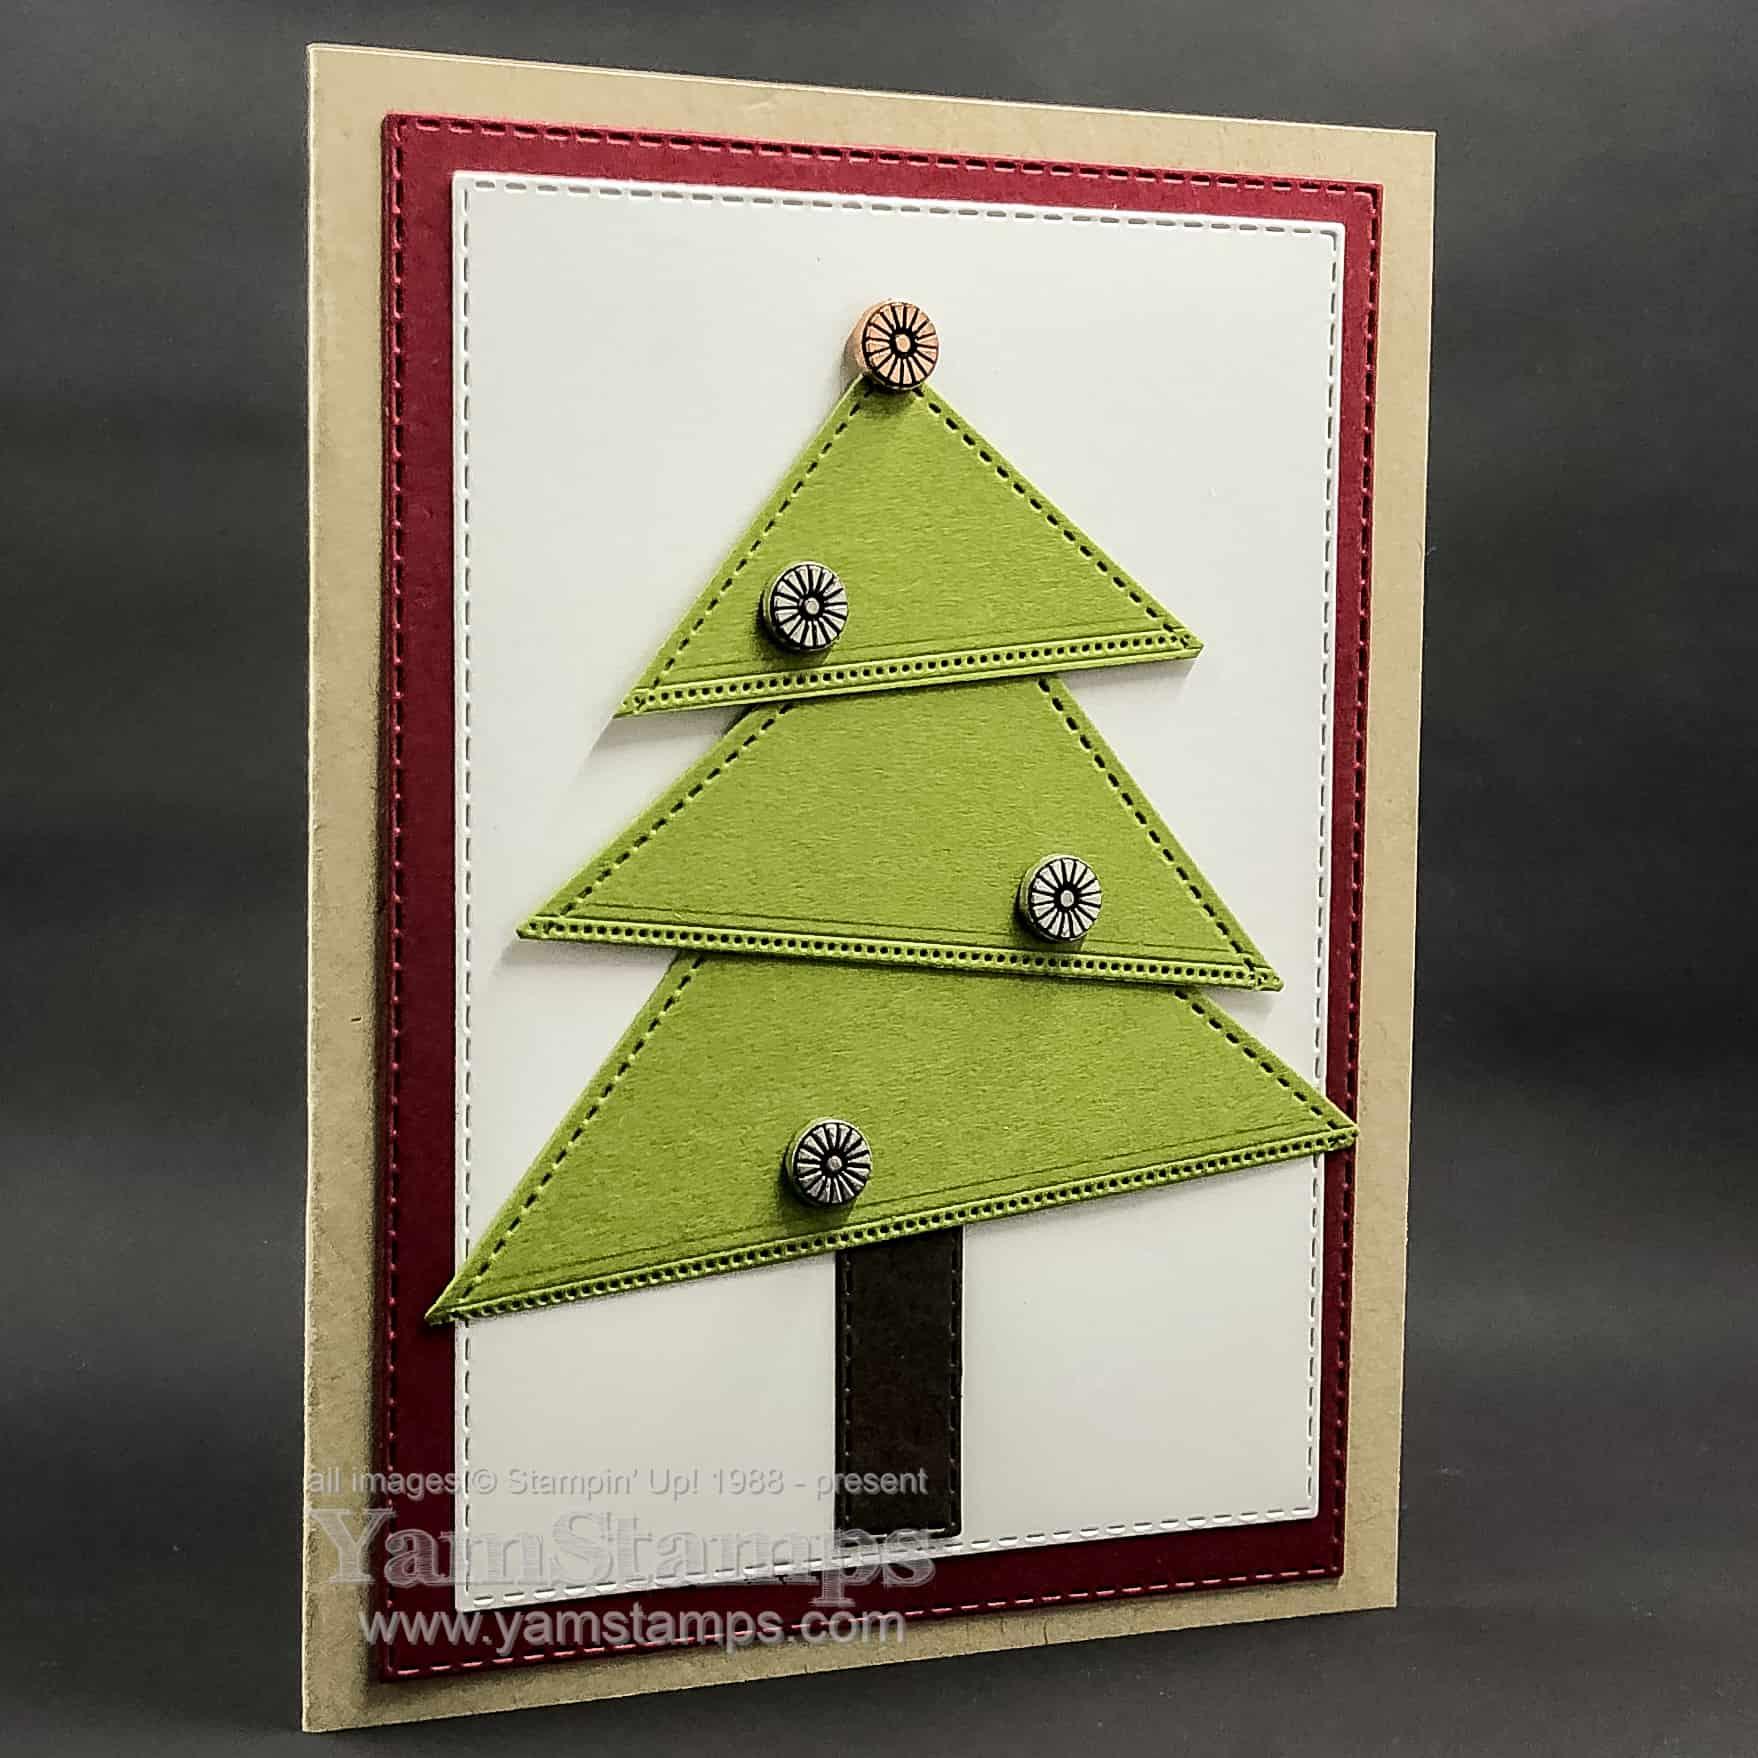 Diy Christmas Card Ideas 1 Yamstamps Com Linda S